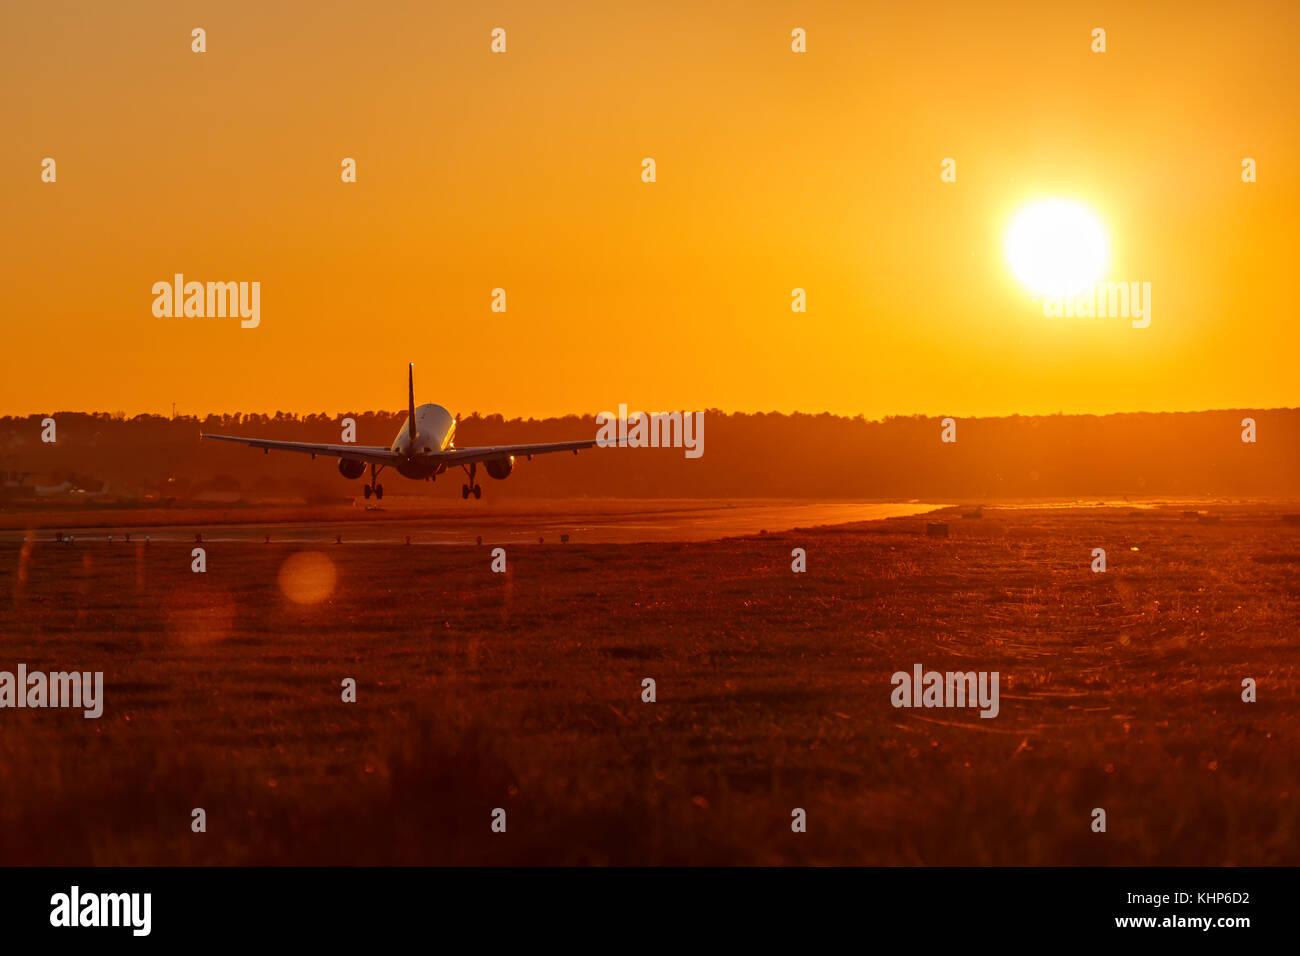 Flugzeug Landung Flughafen Sonne Sonnenuntergang Urlaub Ferien Reisen Reisen Flugzeug Flugzeug reisen Stockbild